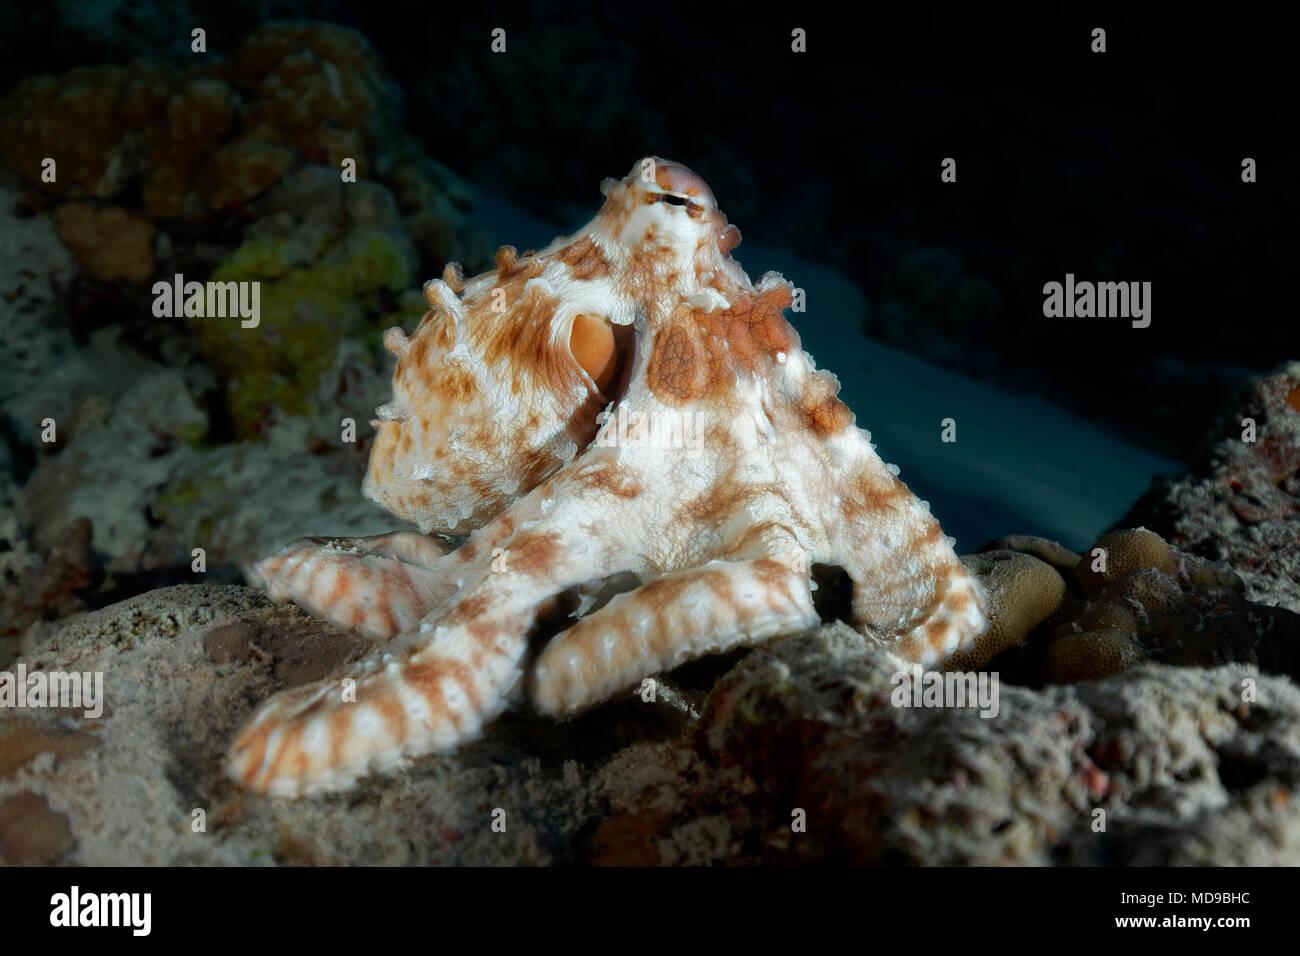 Common Octopus (Octopus vulgaris), at night, Indian Ocean, Maldives - Stock Image